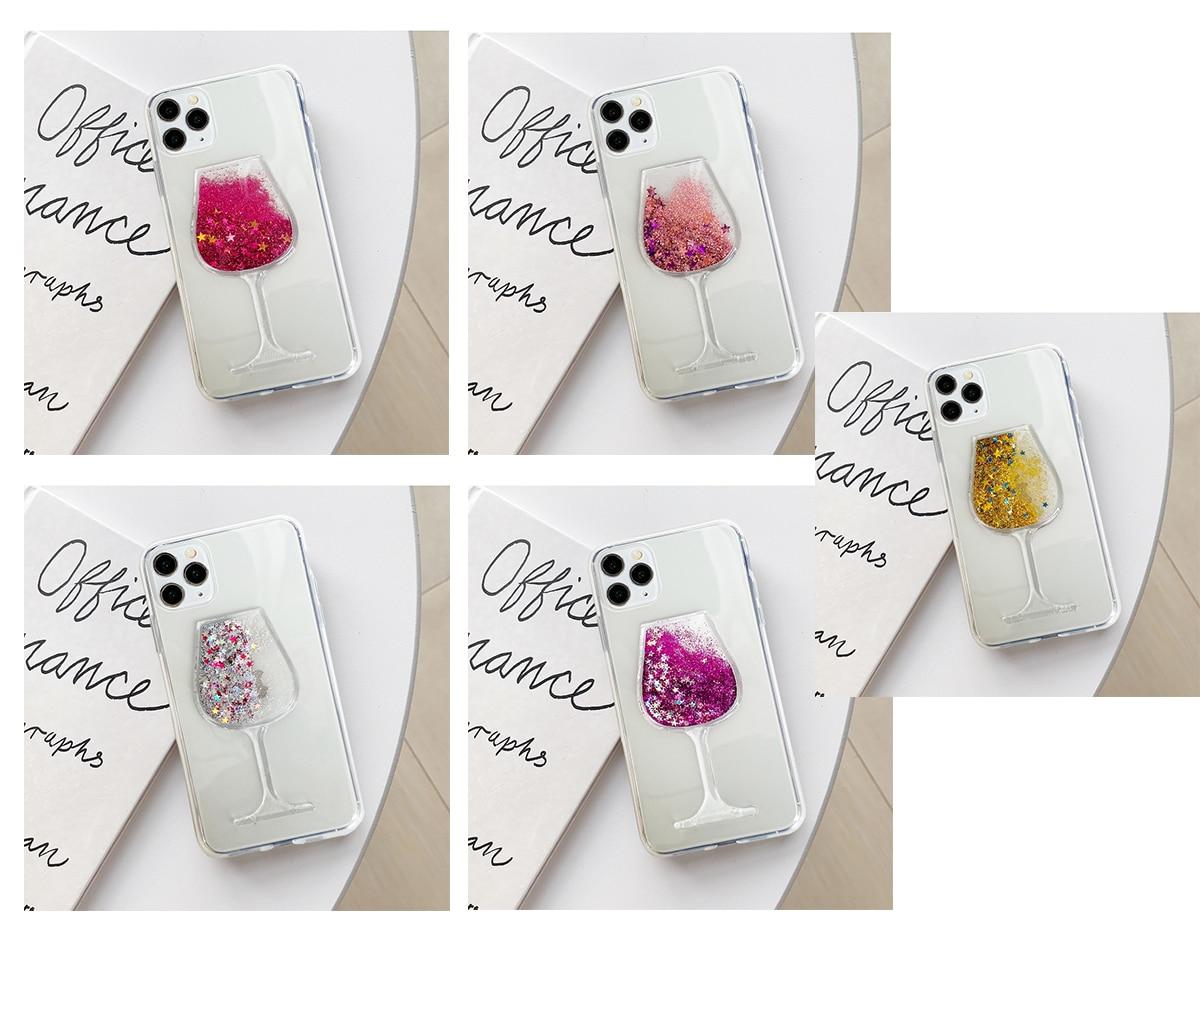 Wine Glass Glitter Star Water Liquid Phone Case for Samsung GALAXY A20S A21 A31 A40 A40S A41 A50 A30S A50S M30 Soft TPU Cover